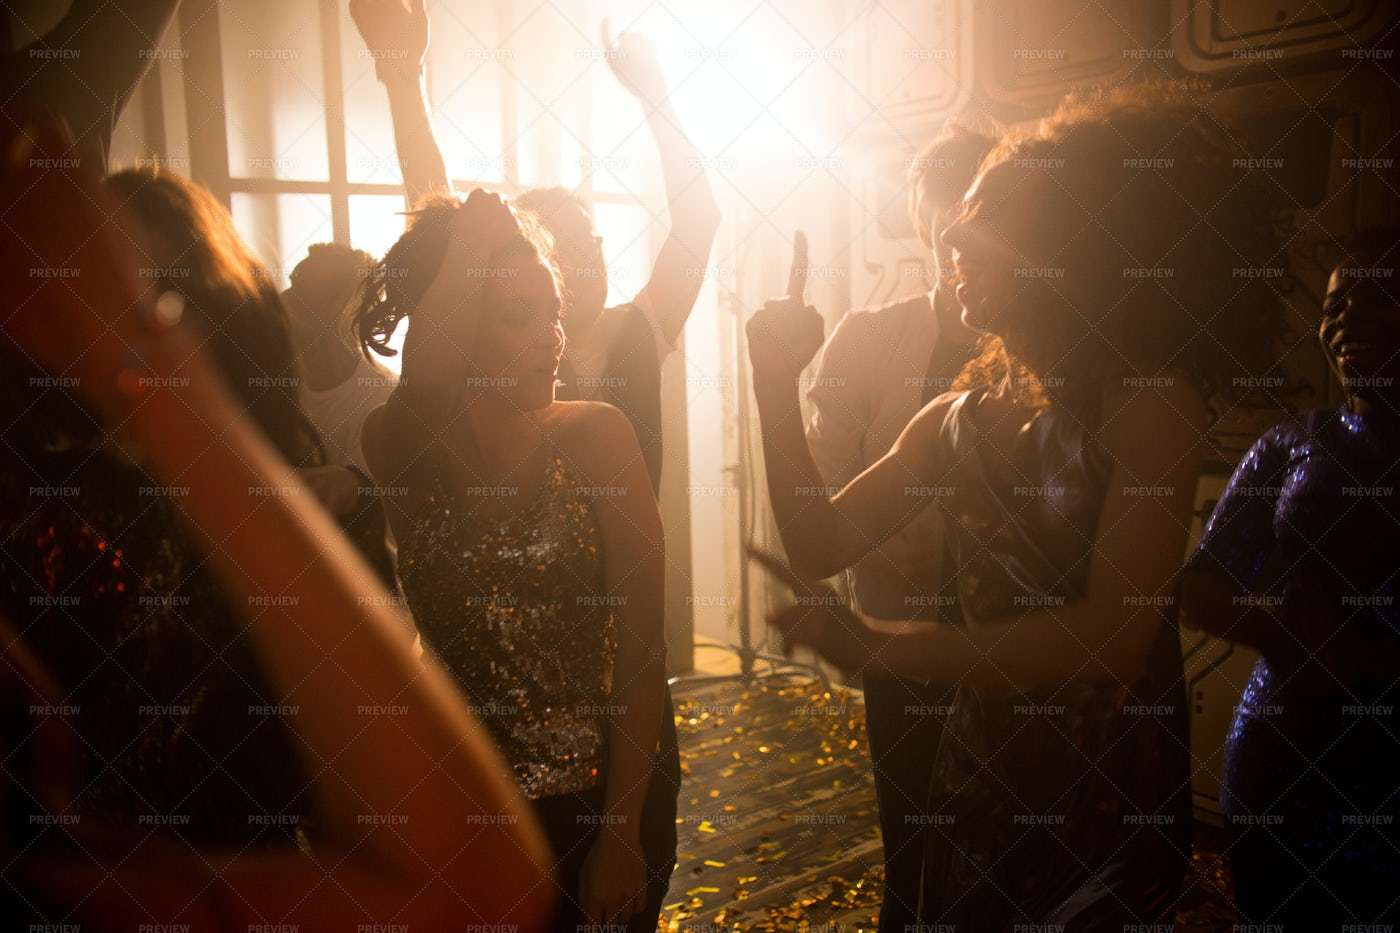 Crowd Of People In Nightclub: Stock Photos